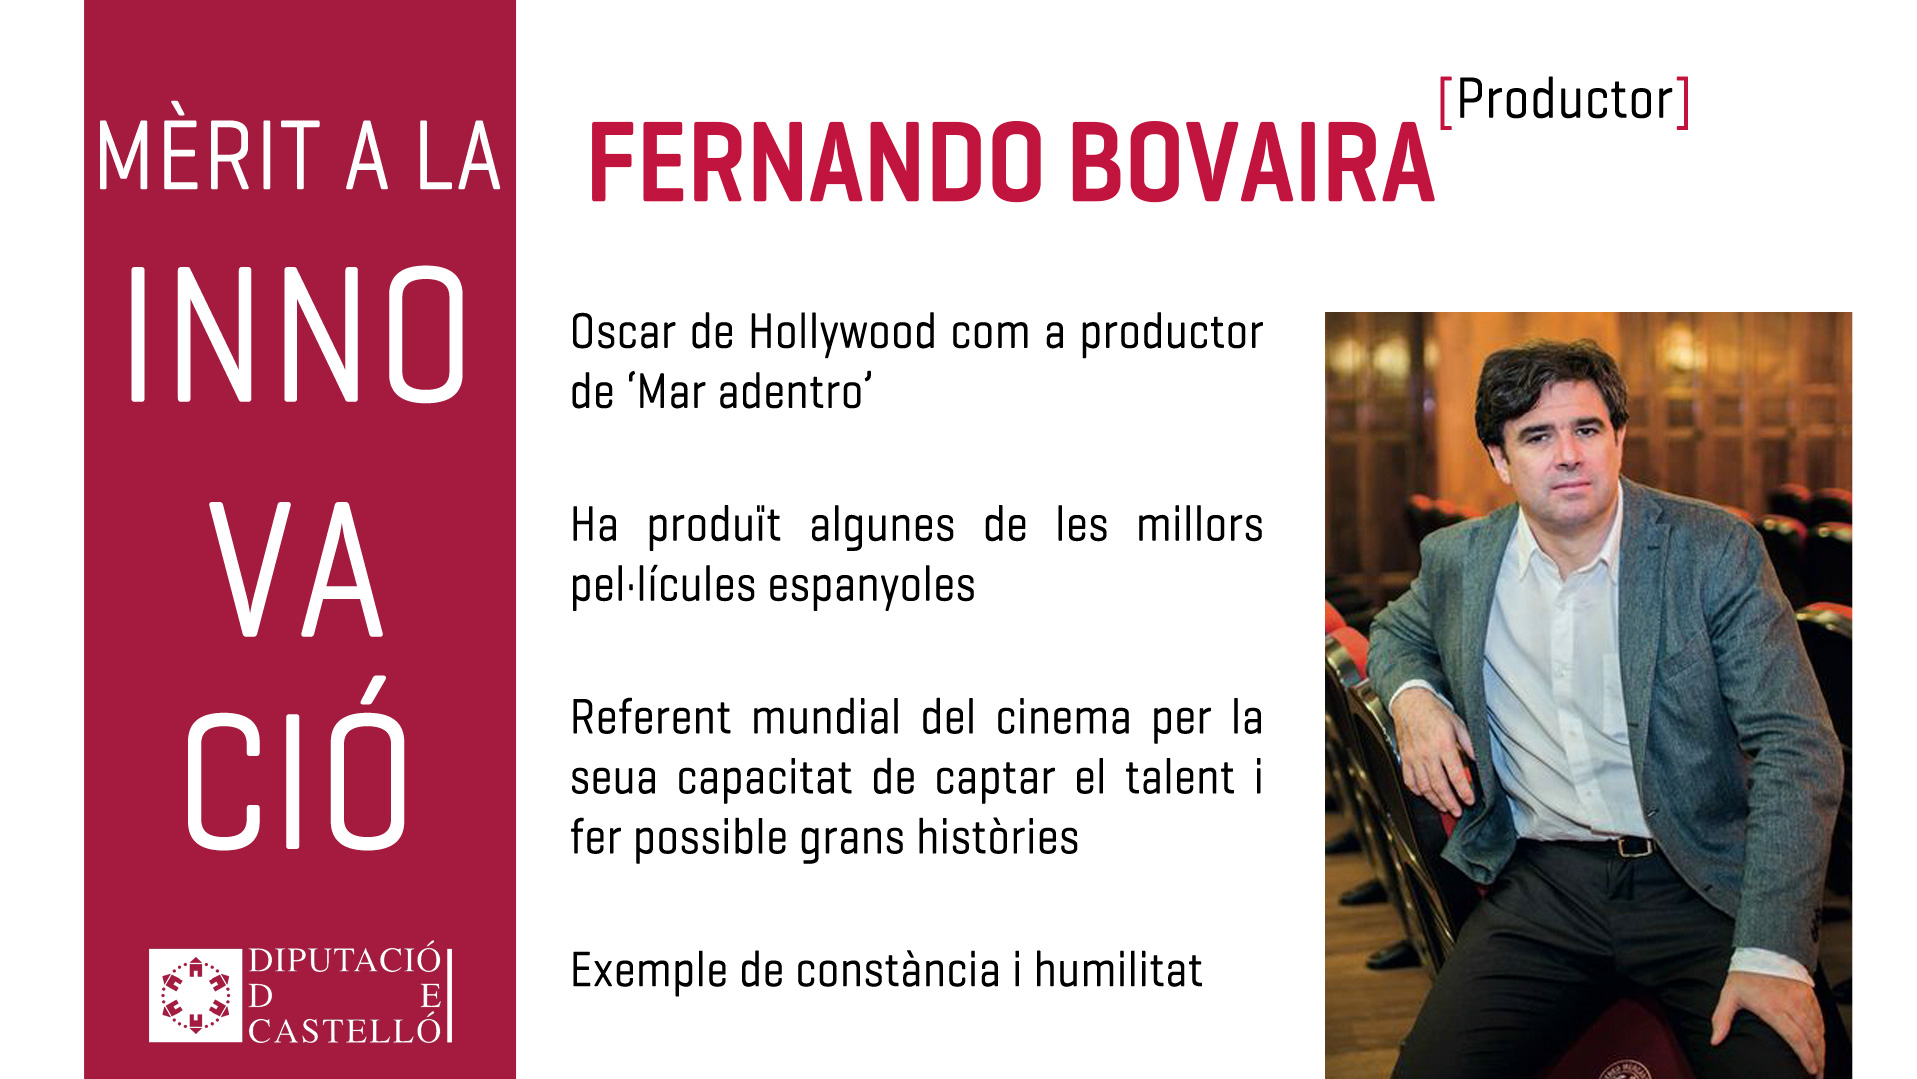 Fernando Bovaira